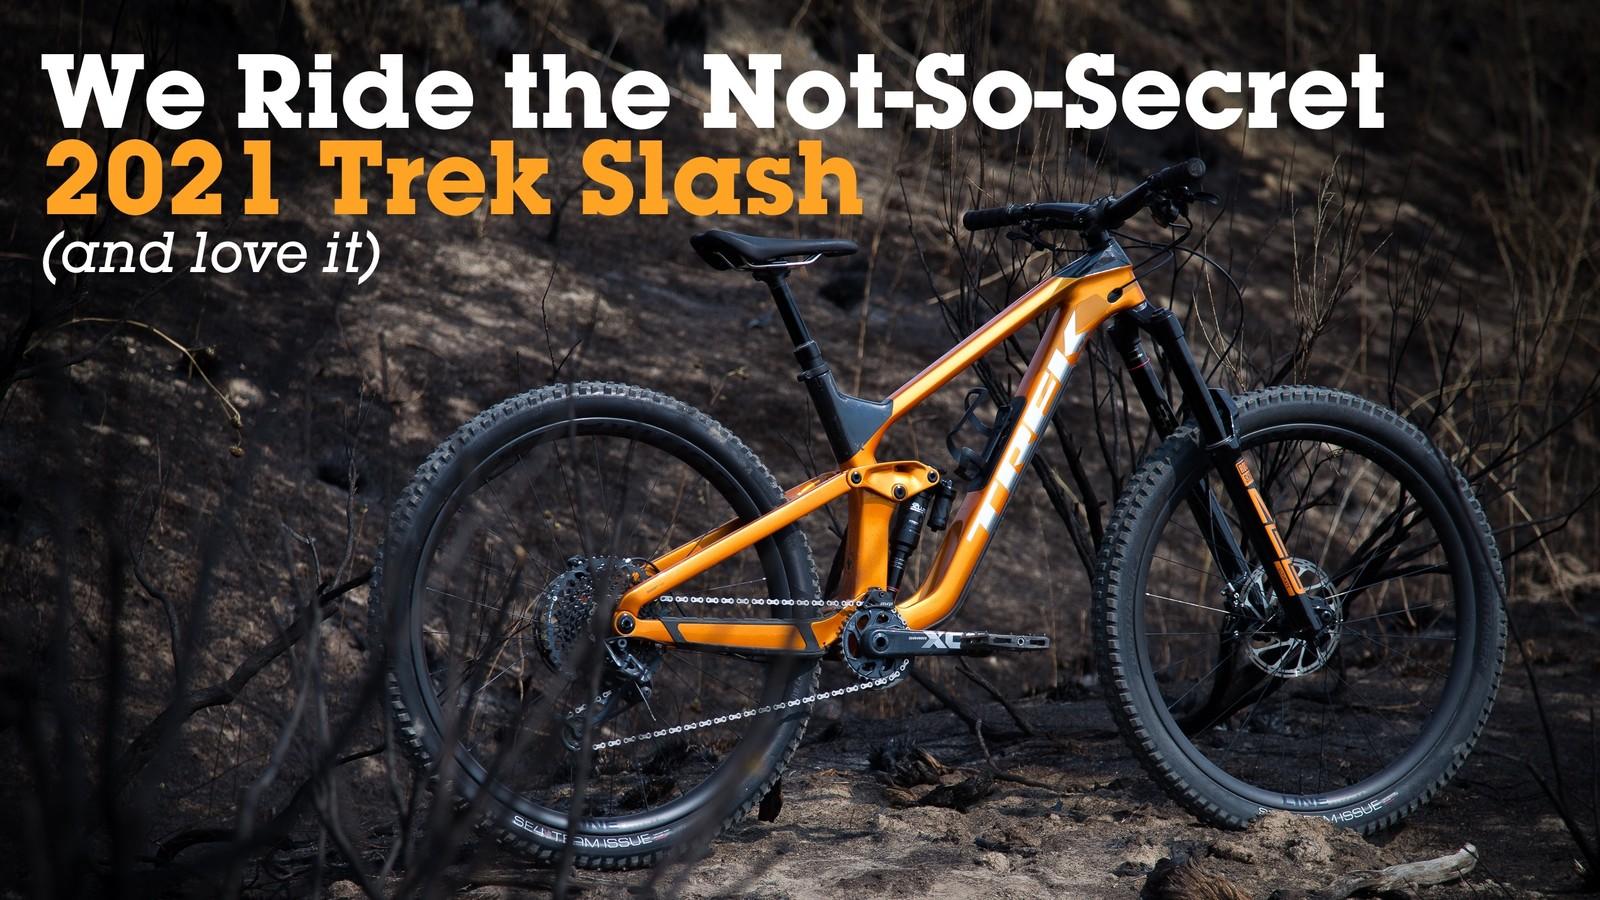 We Ride the Not-So-Secret 2021 Trek Slash (and love it)